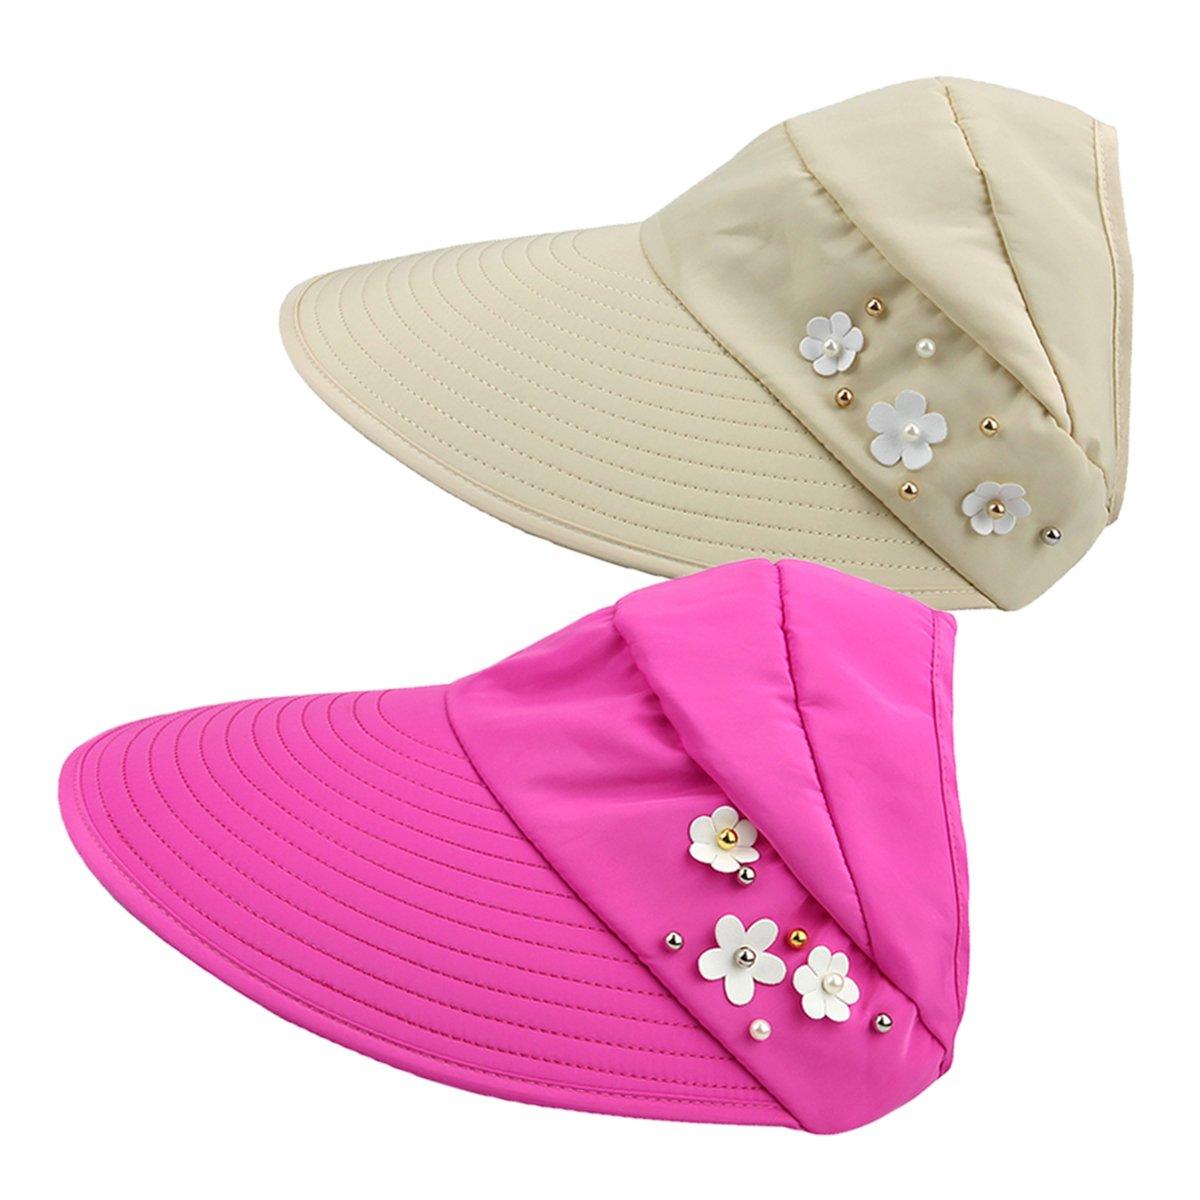 Women\'s Roll Up Topless Wide Brim Visor Cap 2 Packs Summer Sun Hat Adjustable Foldable Cotton UV Protection Hat